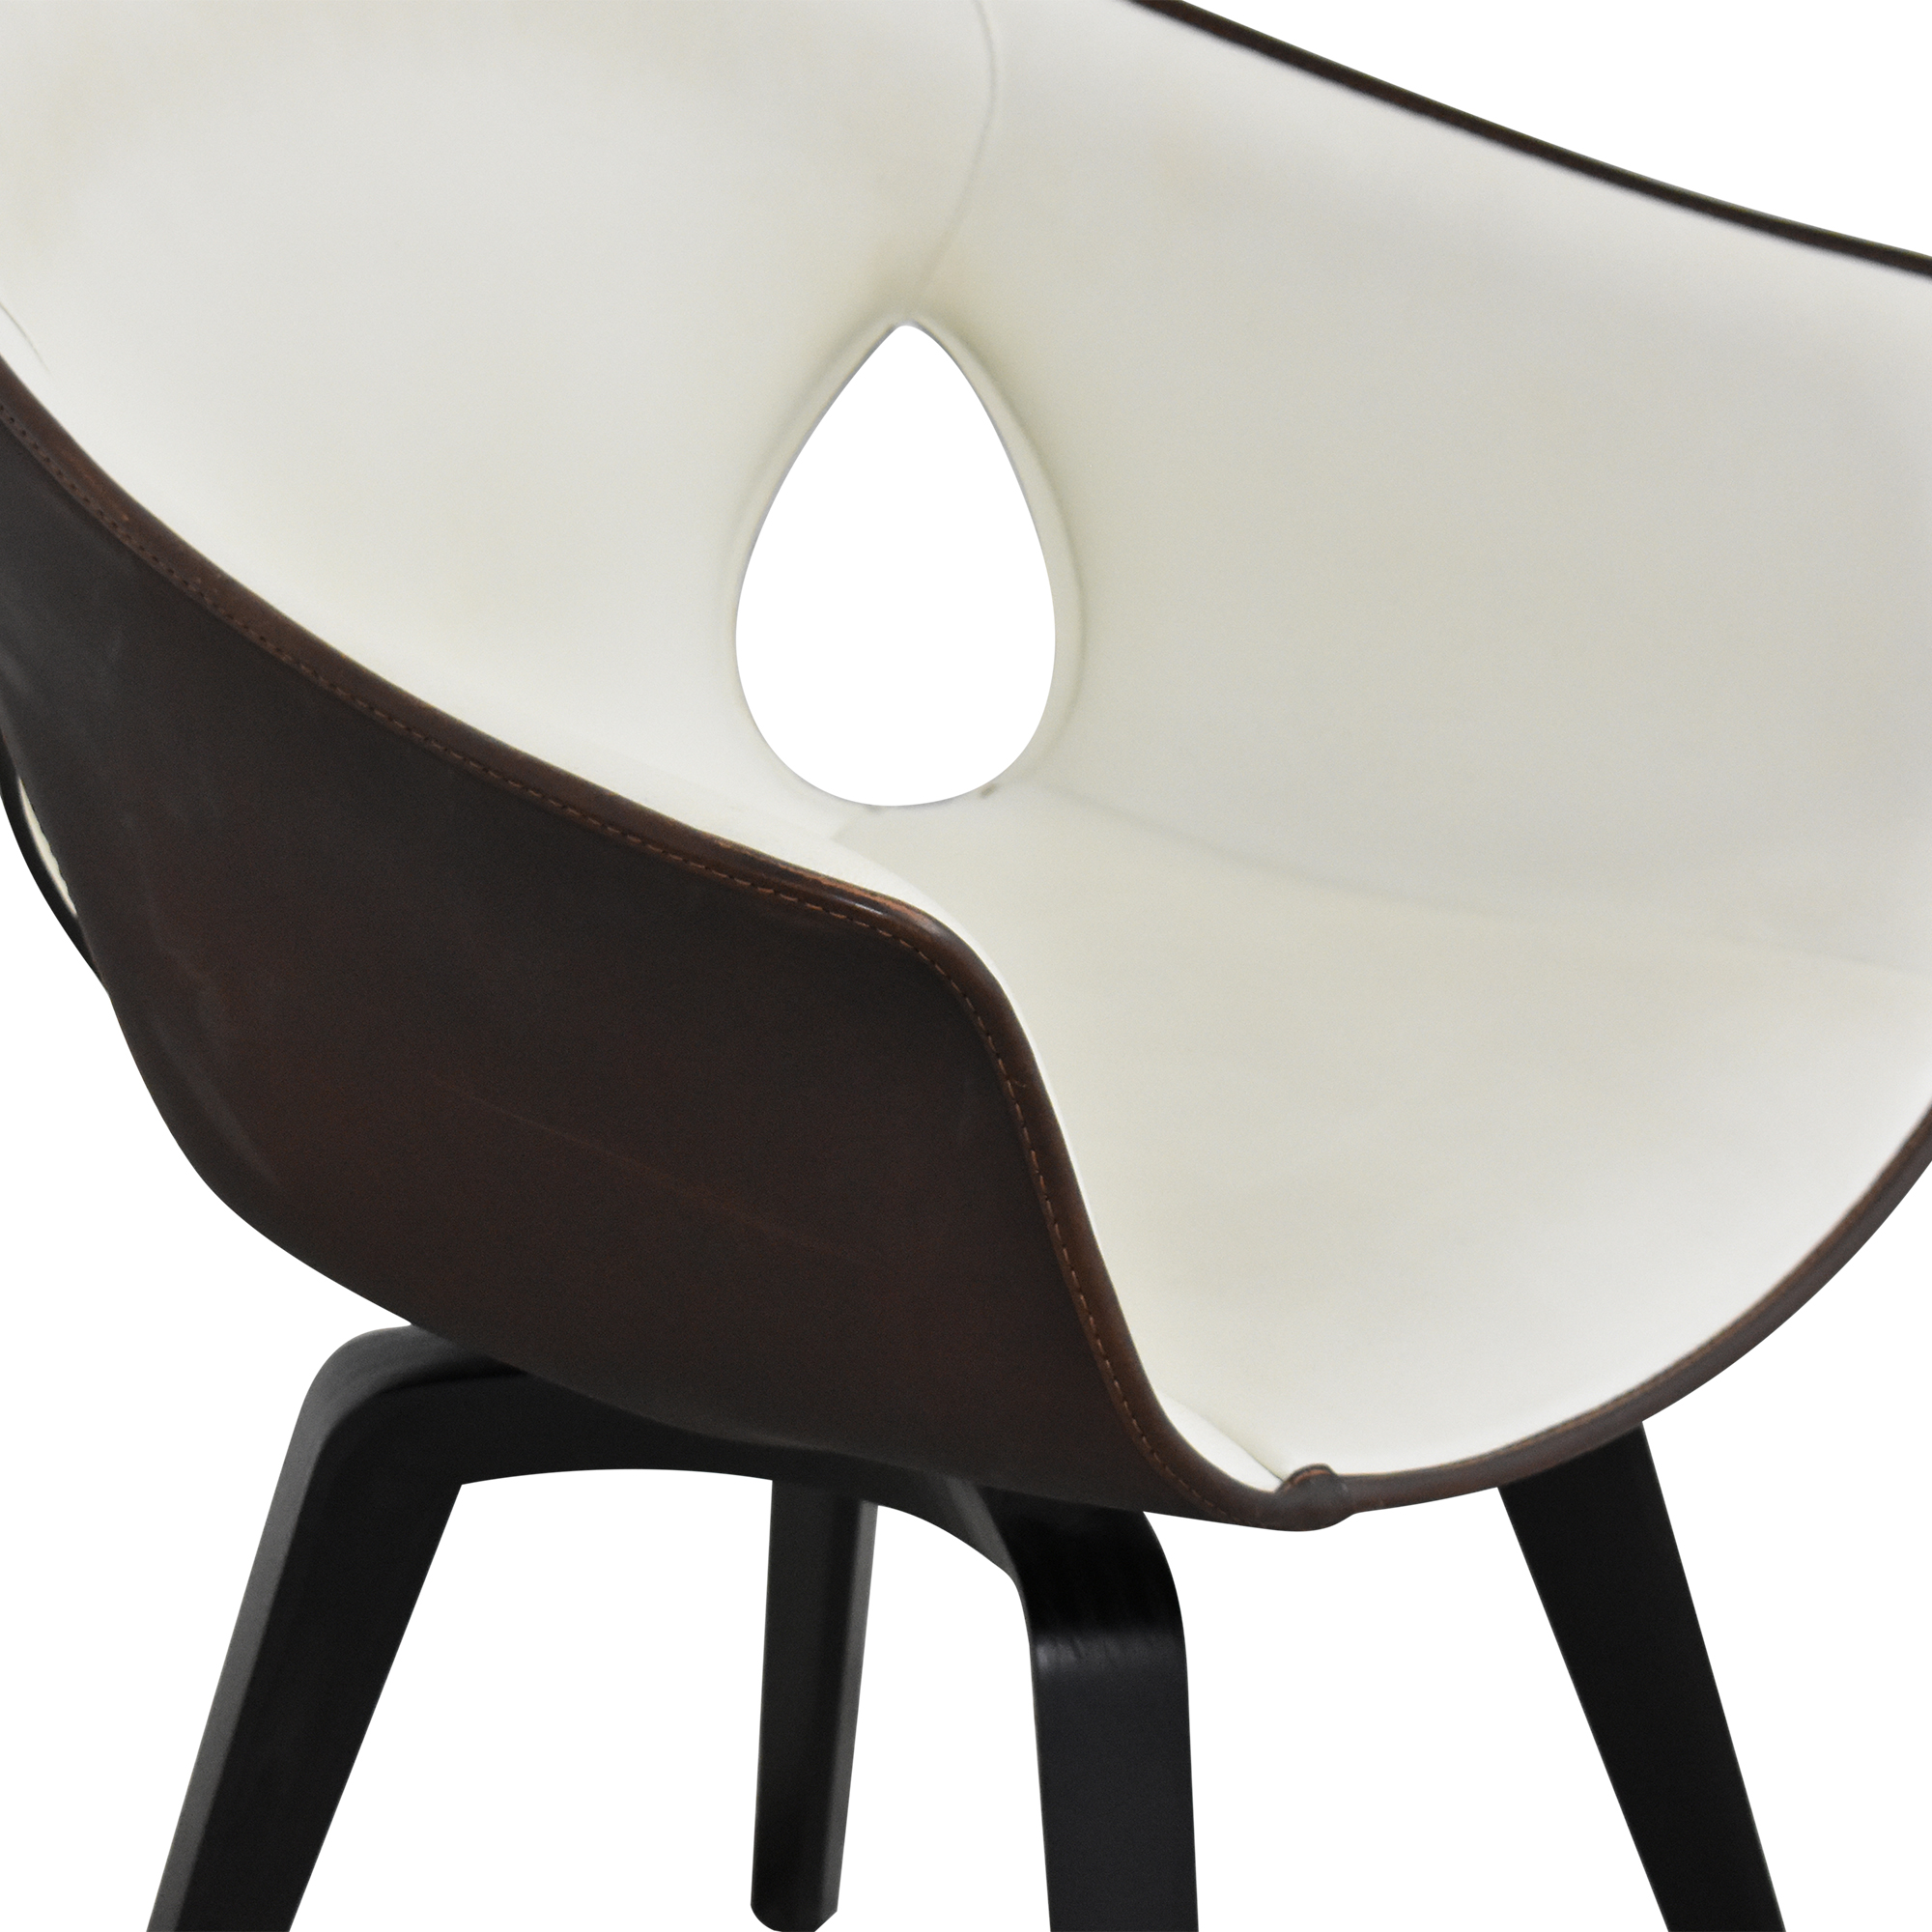 Poltrona Frau Poltrona Frau Ginger Side Chair ct